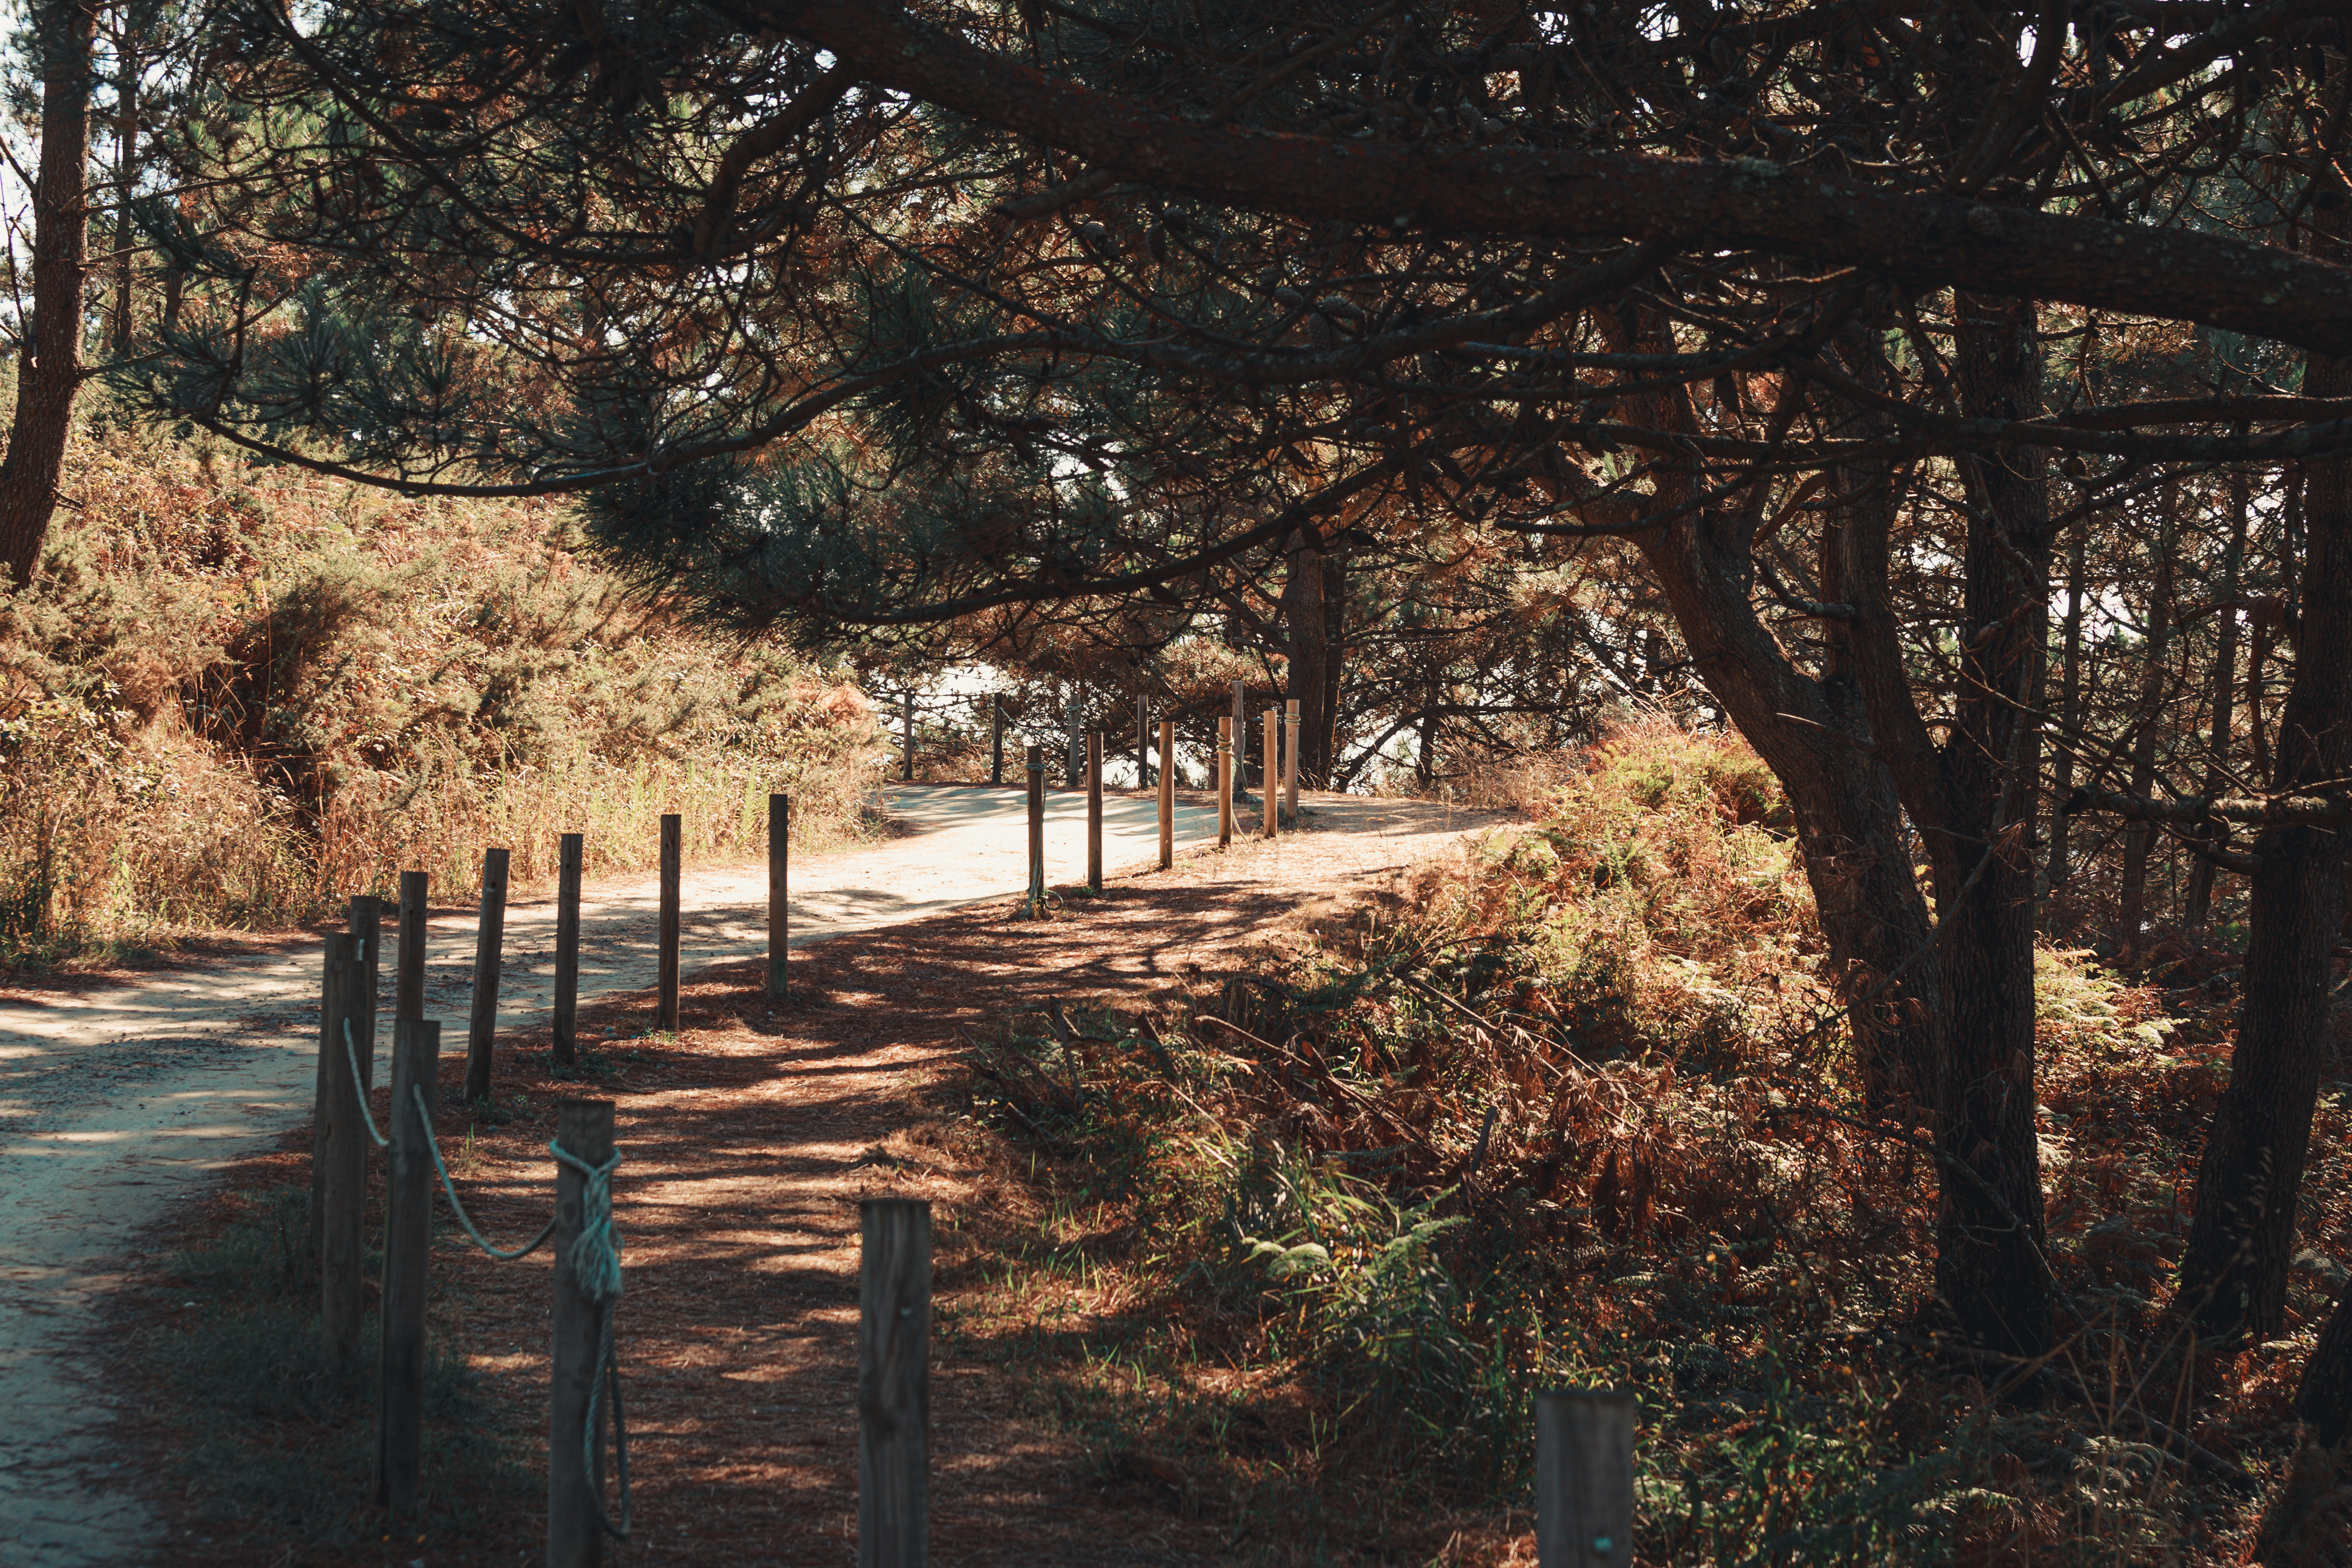 tiro horizontal del camino de la naturaleza